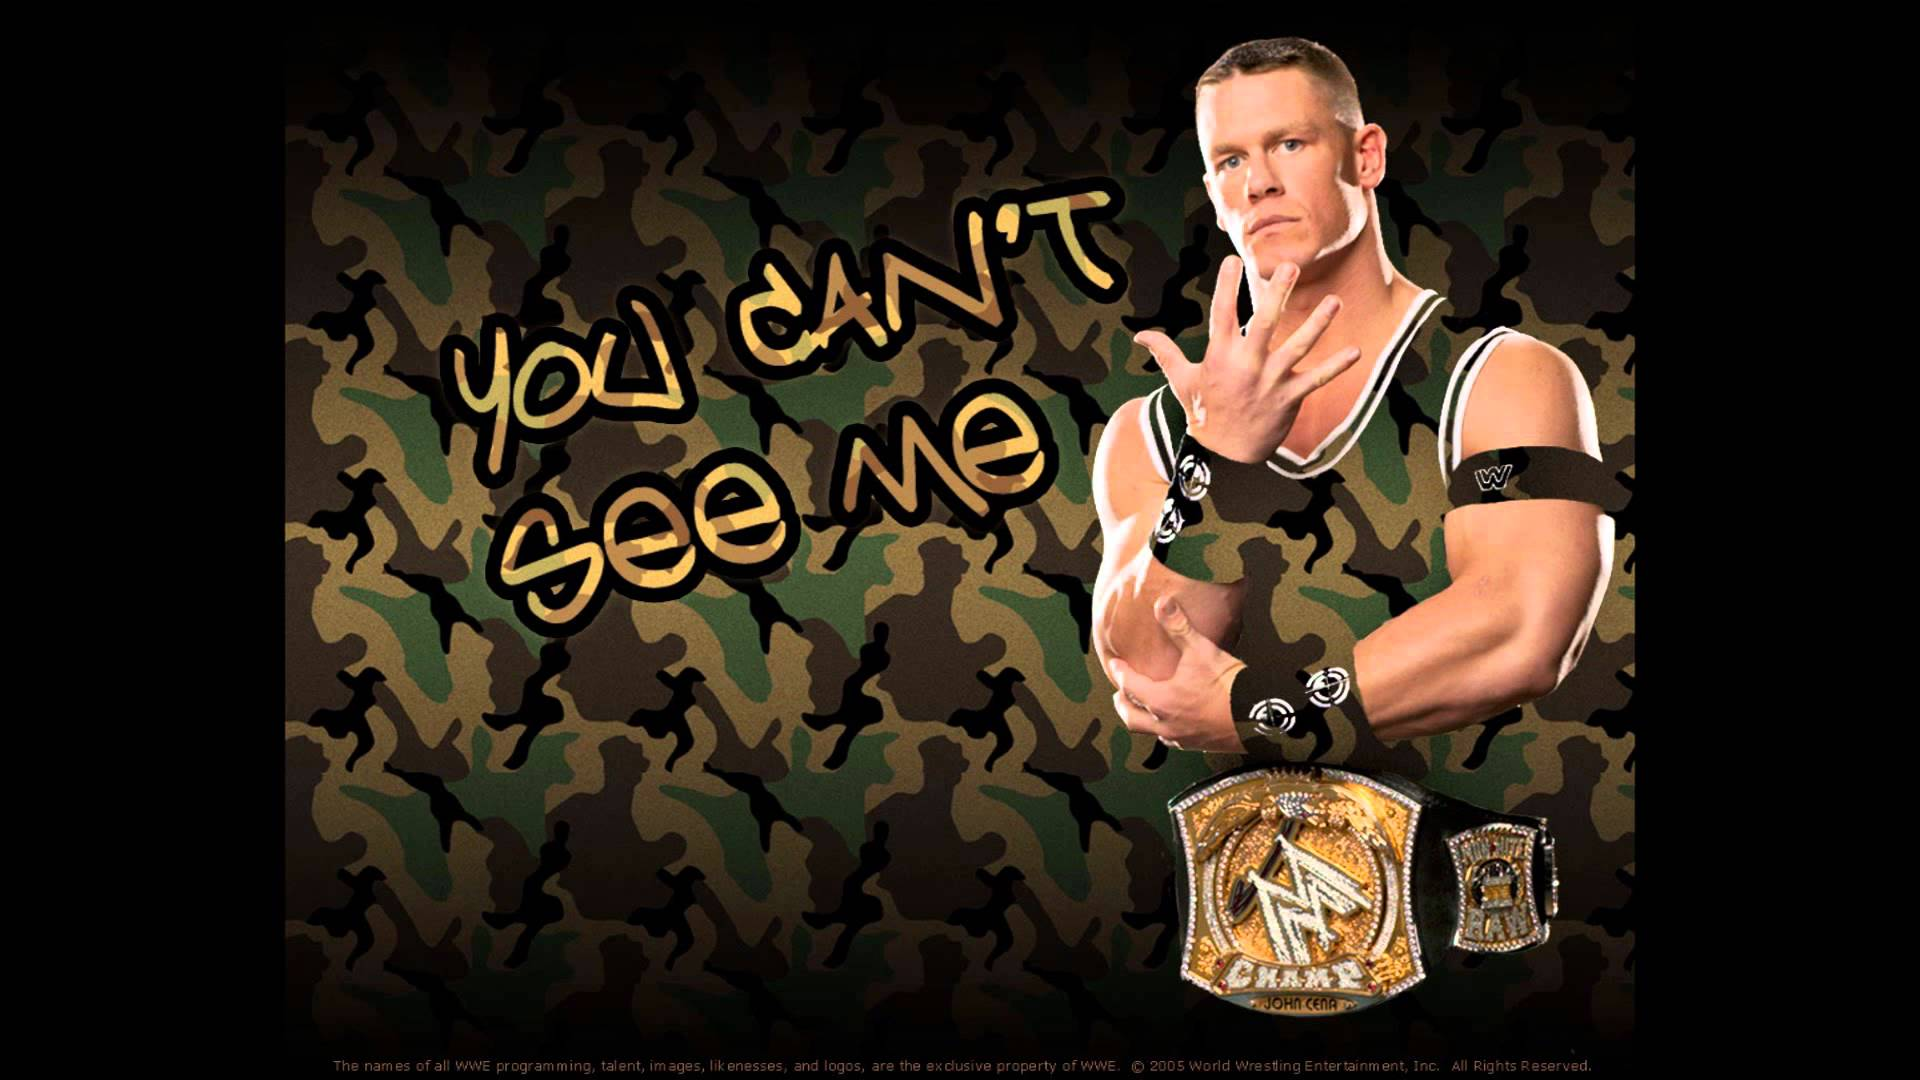 John Cena Wallpapers 2017 Hd Wallpaper Cave